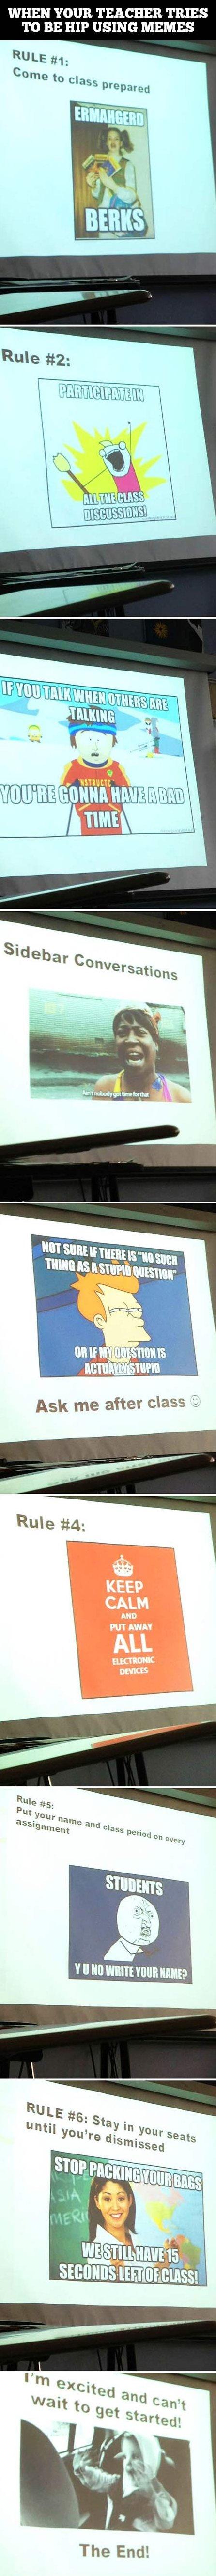 Memes in class